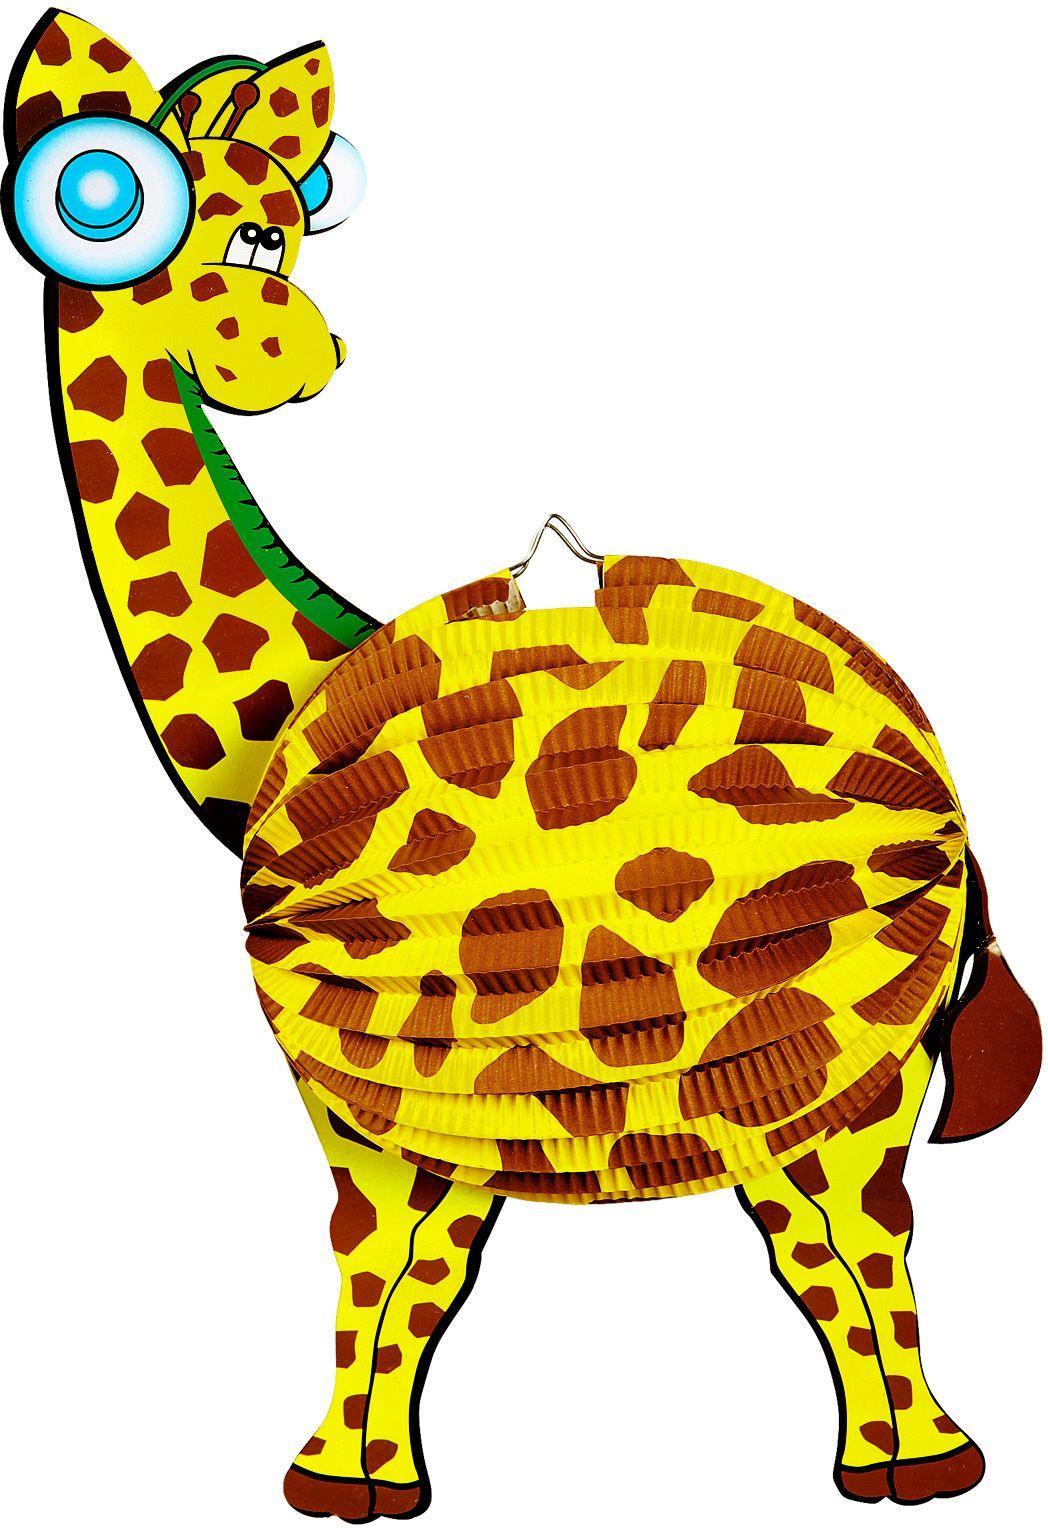 Giraffe lampion